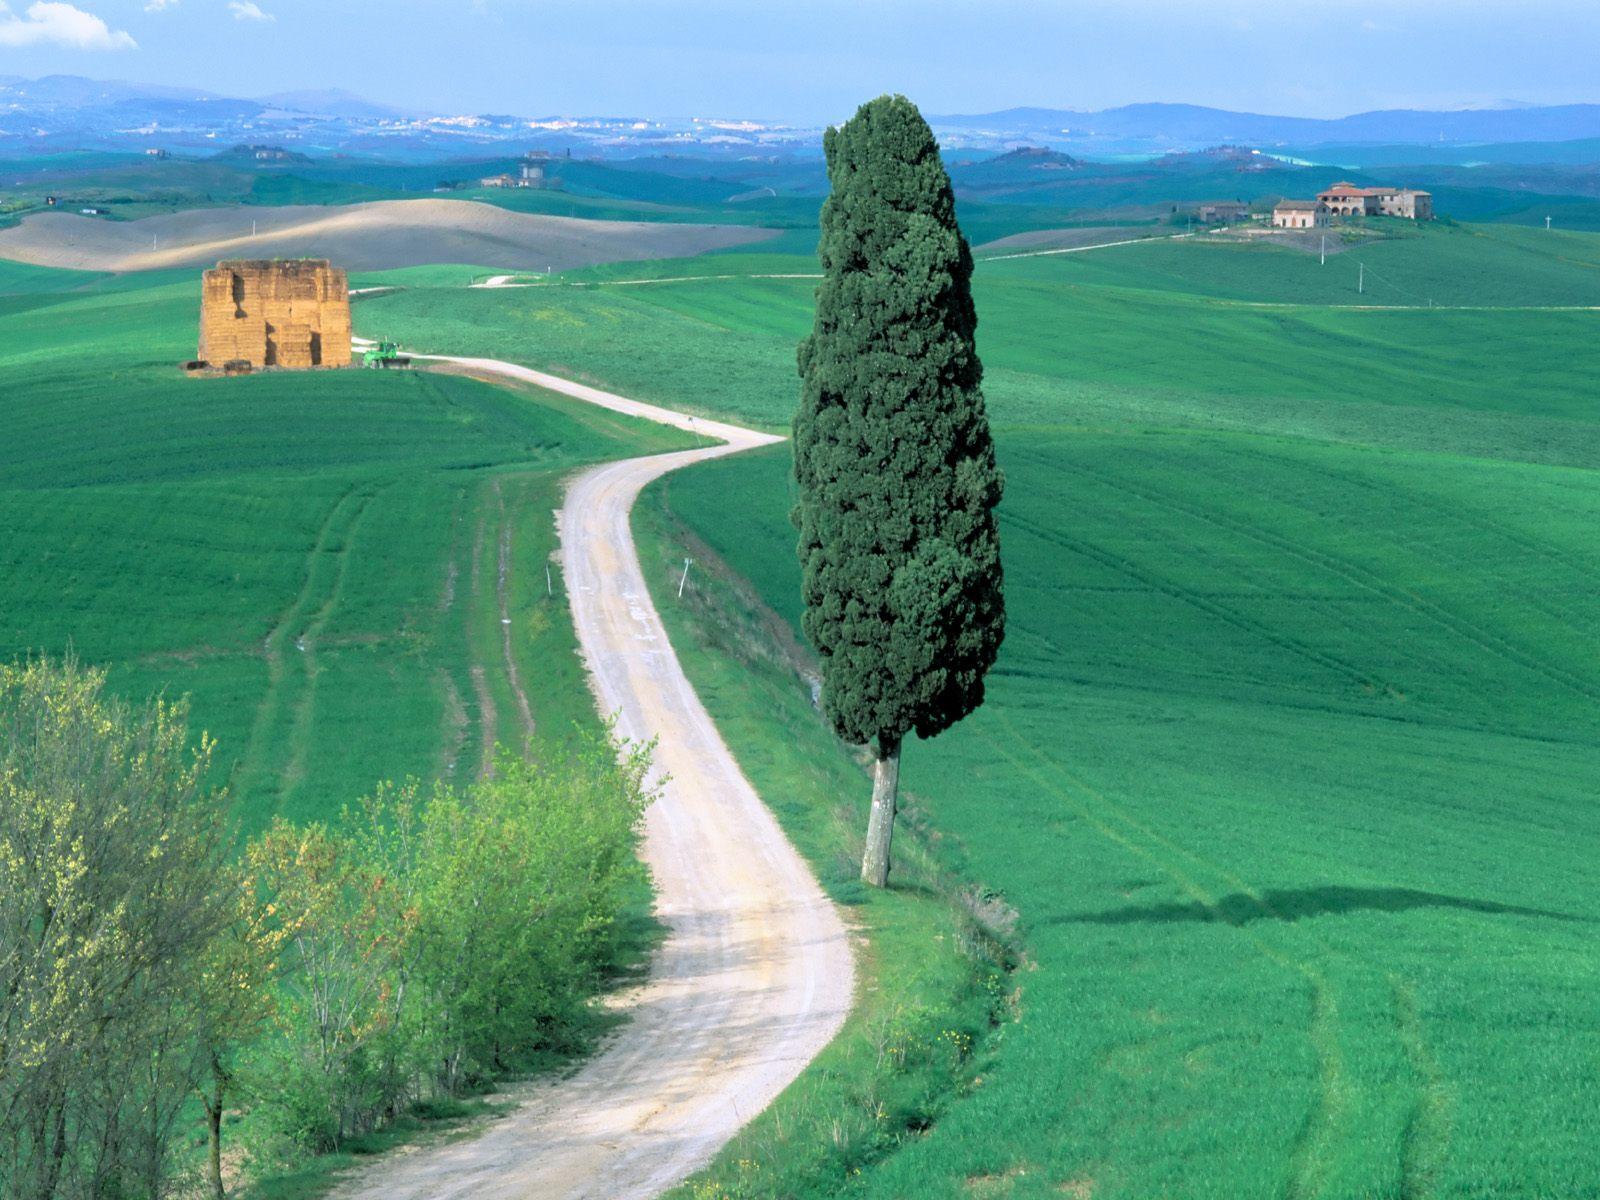 Italy+wallpapers+for+desktop